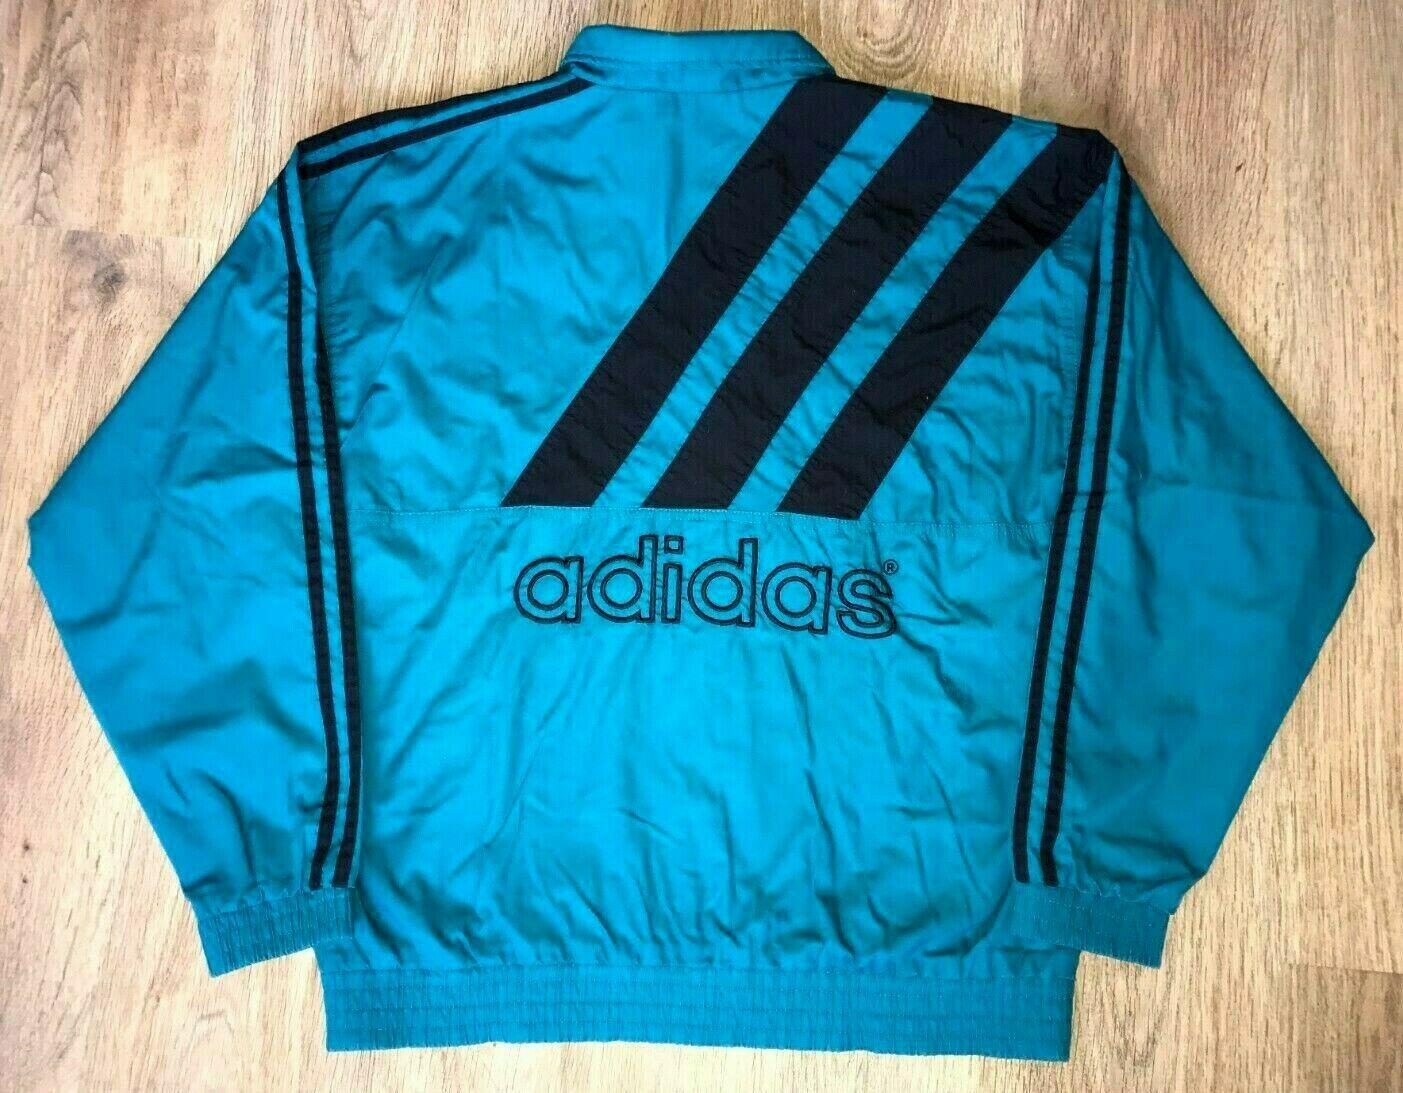 Adidas vintage 90s as equipment Grün Farbeway tracksuit track jacket Größe S